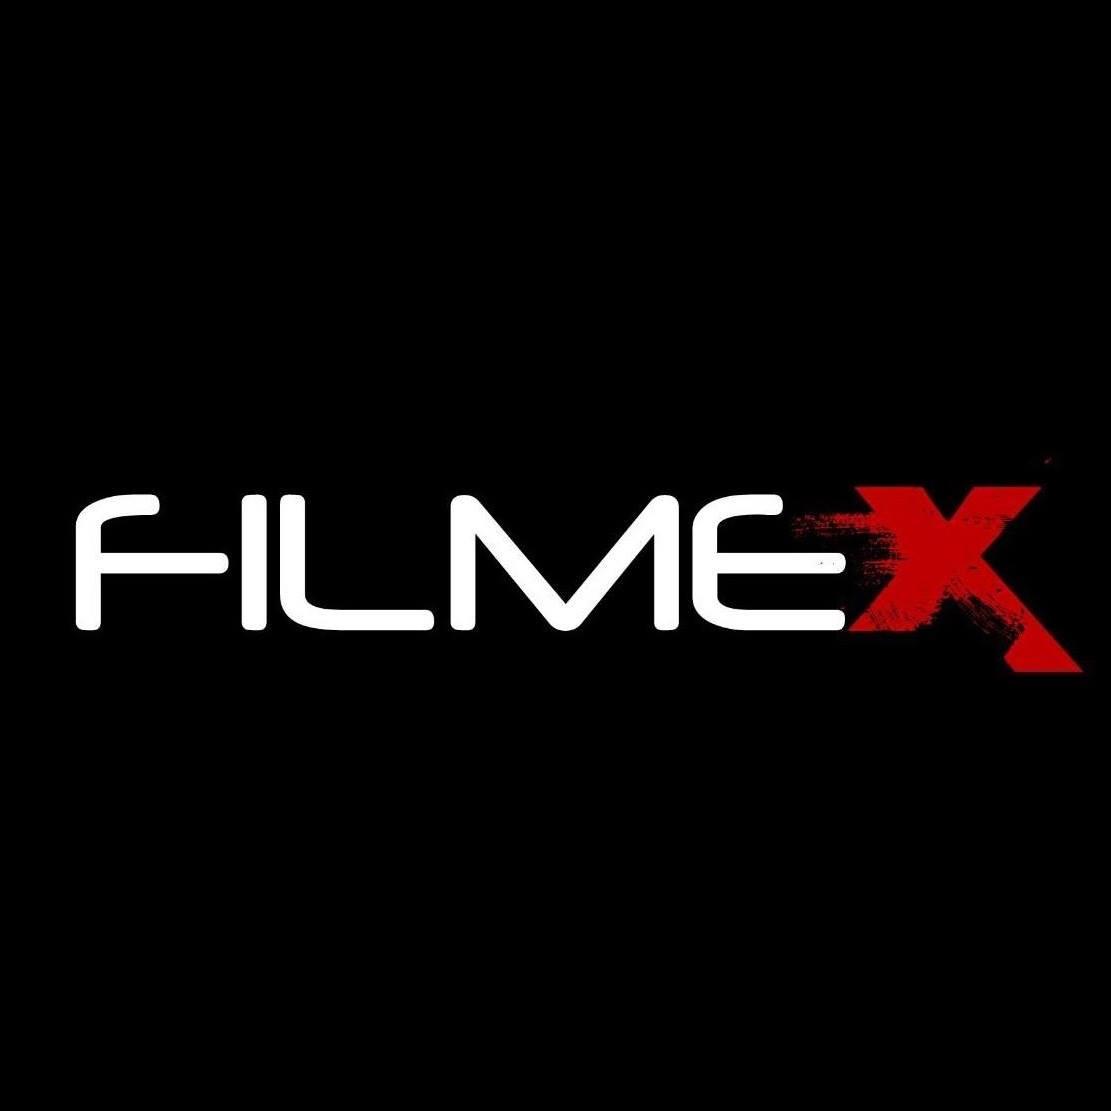 Philmex 2017